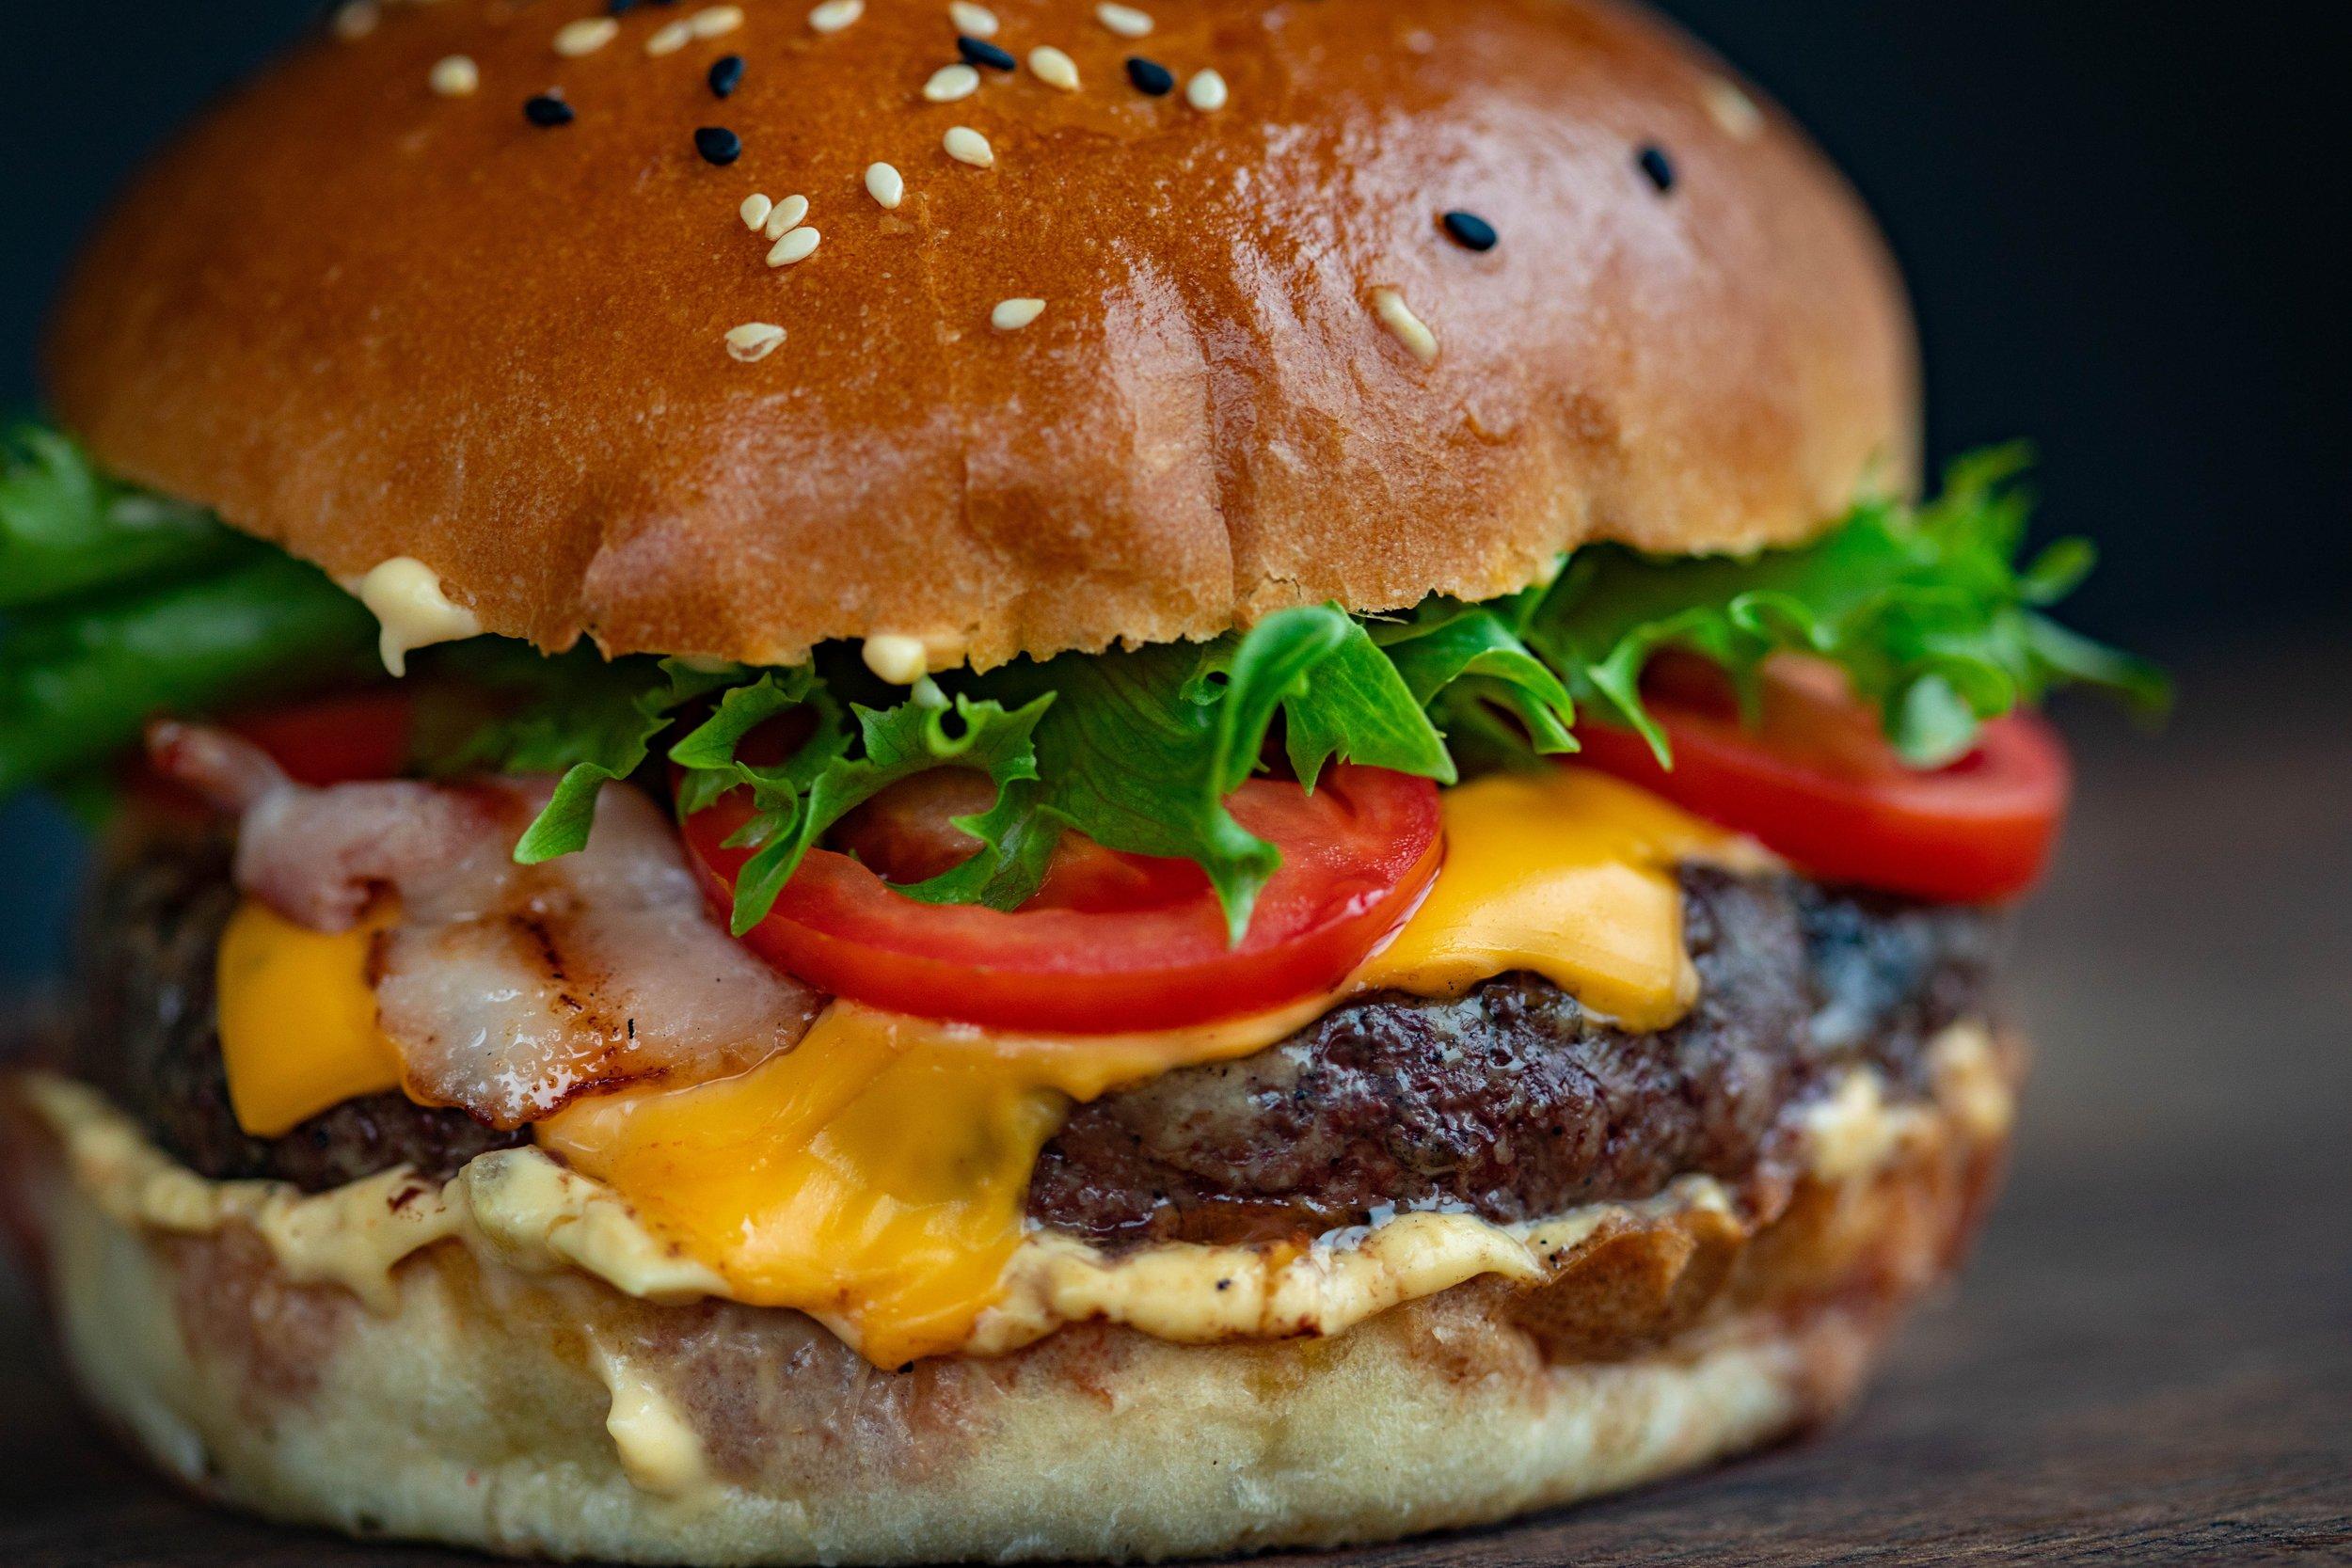 Hawley Burger Company : 2503 US-6, Hawley, PA 18428  (570) 226-2827